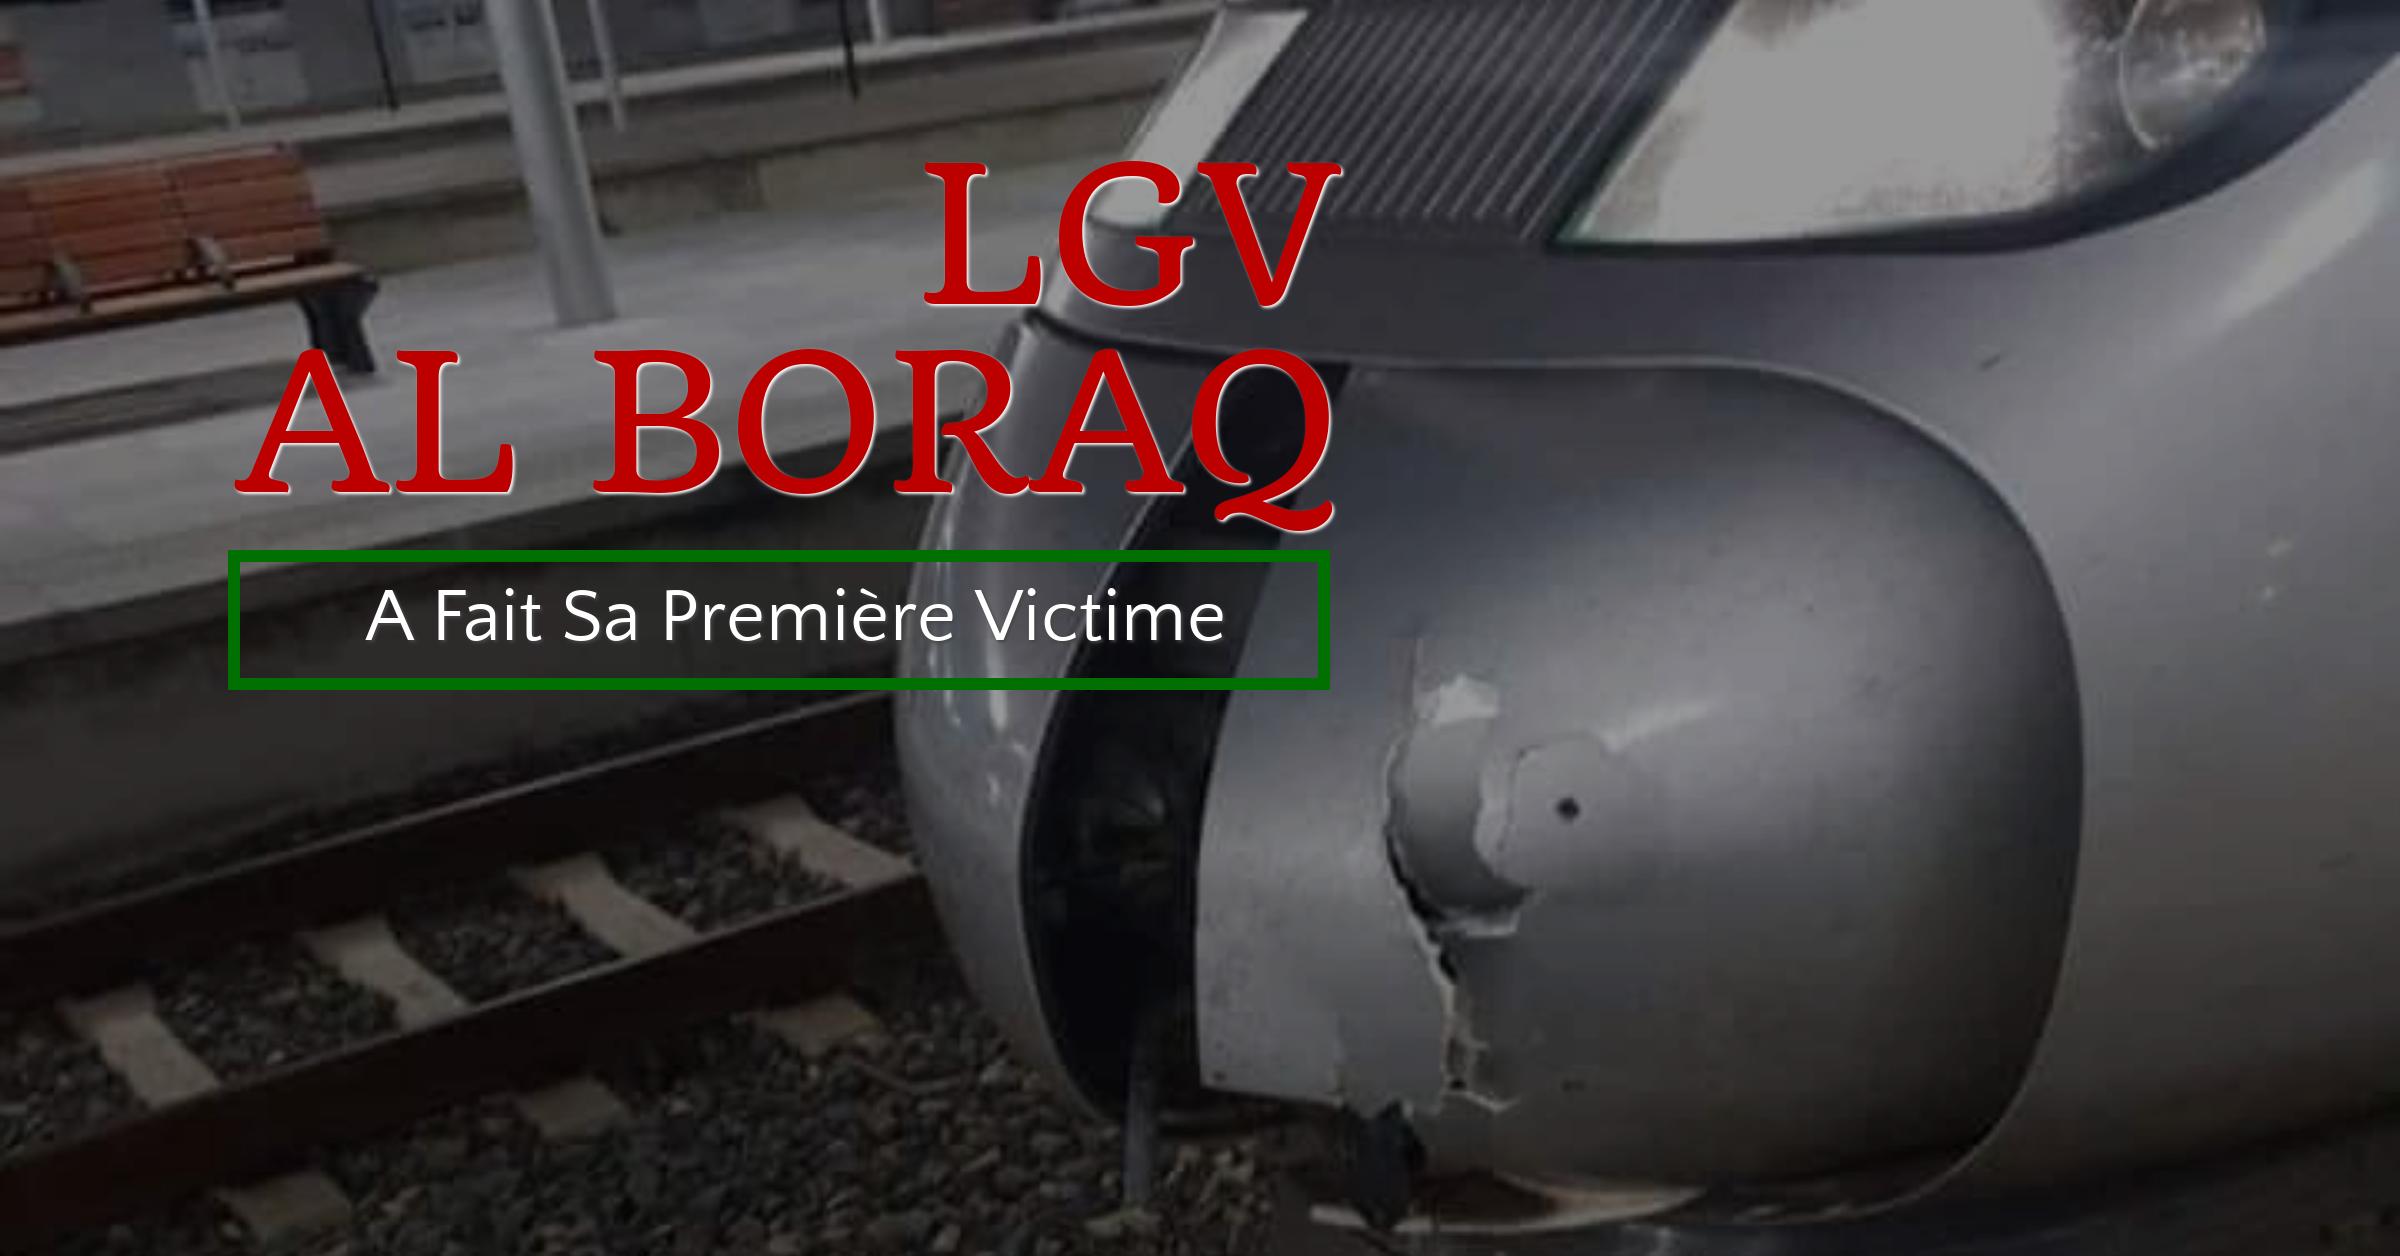 Al Boraq a fait sa première victime